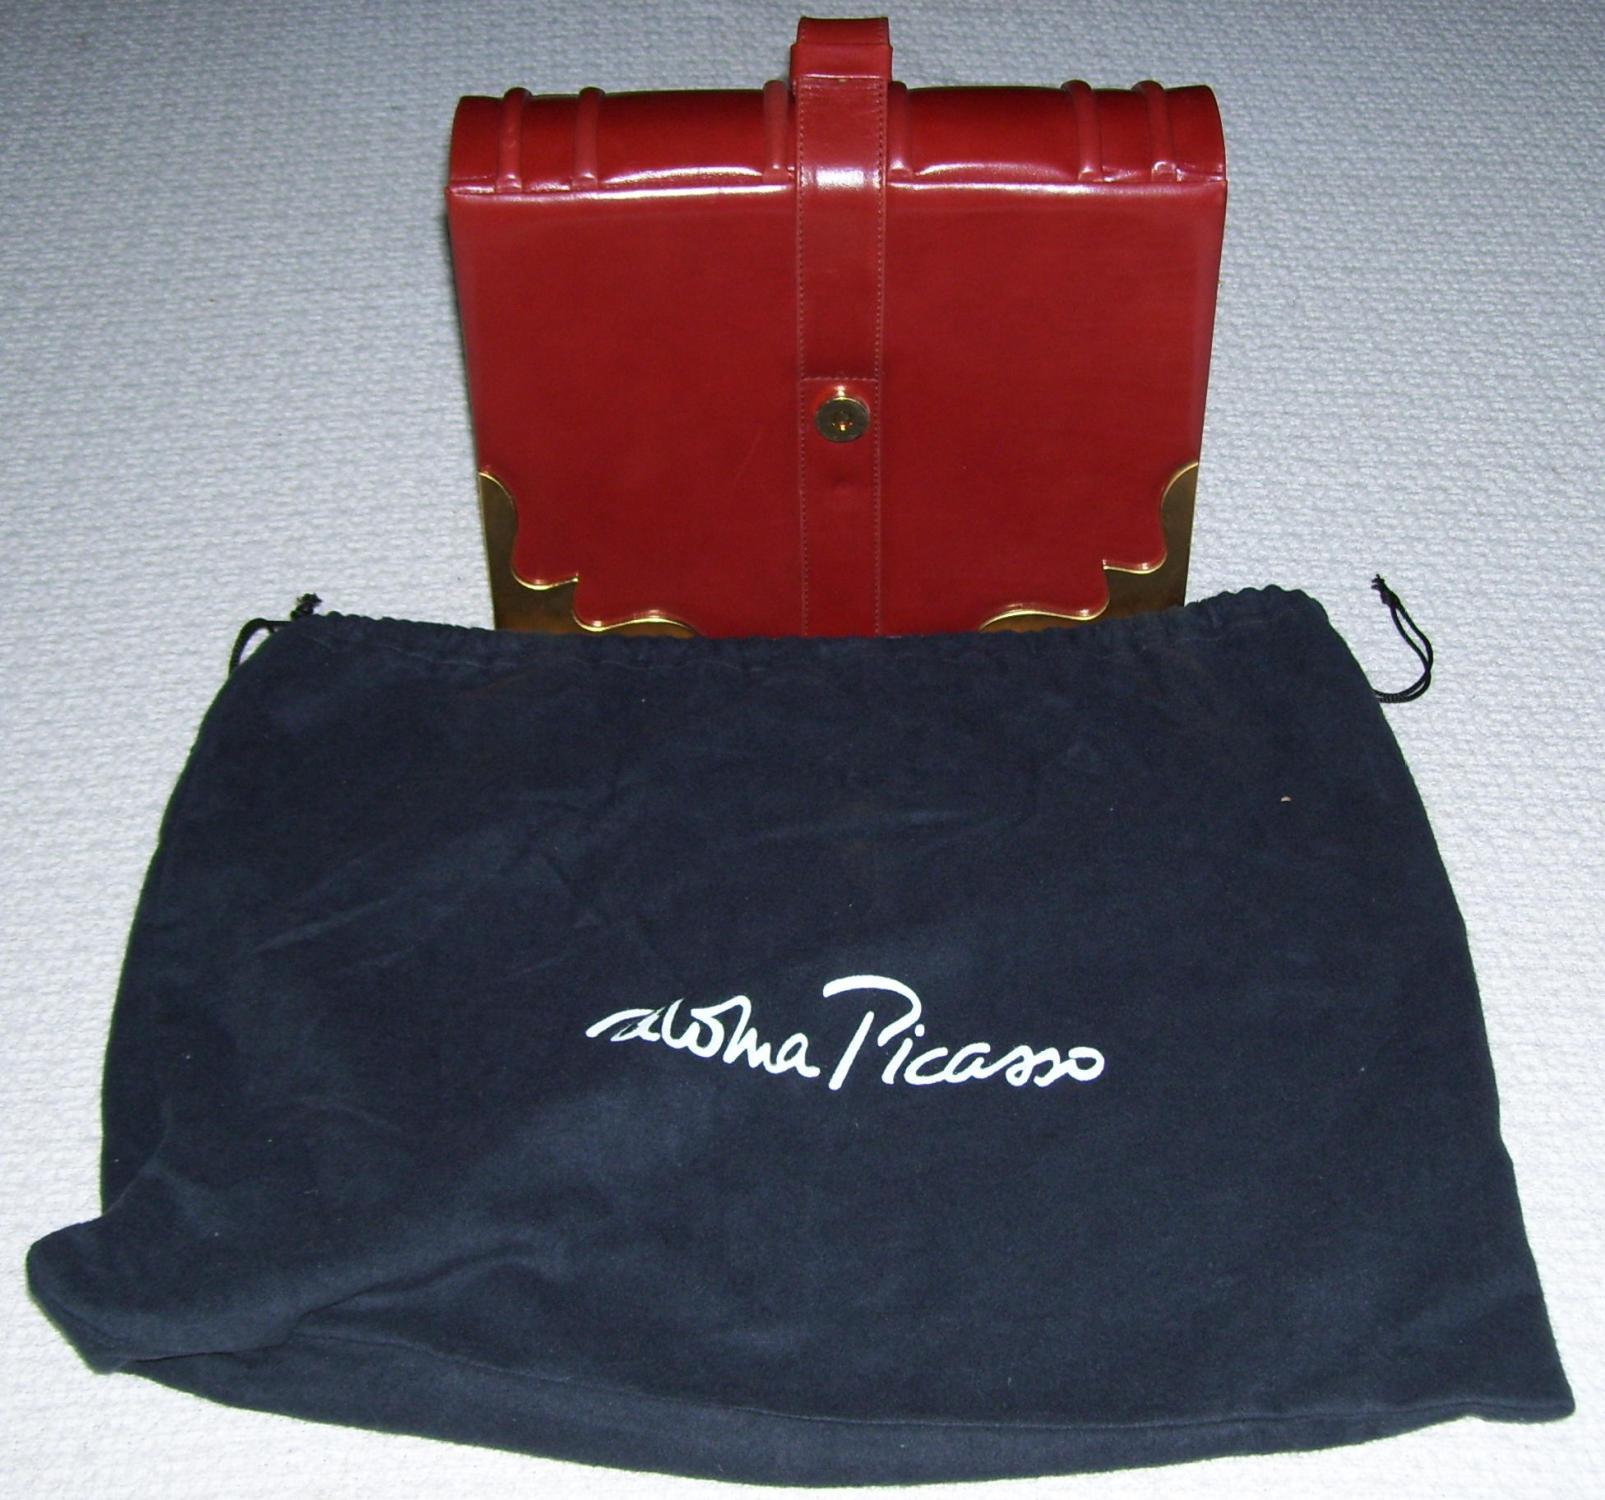 Paloma Picasso Book Purse Picasso, Paloma [As New] (bi_11241178637) photo